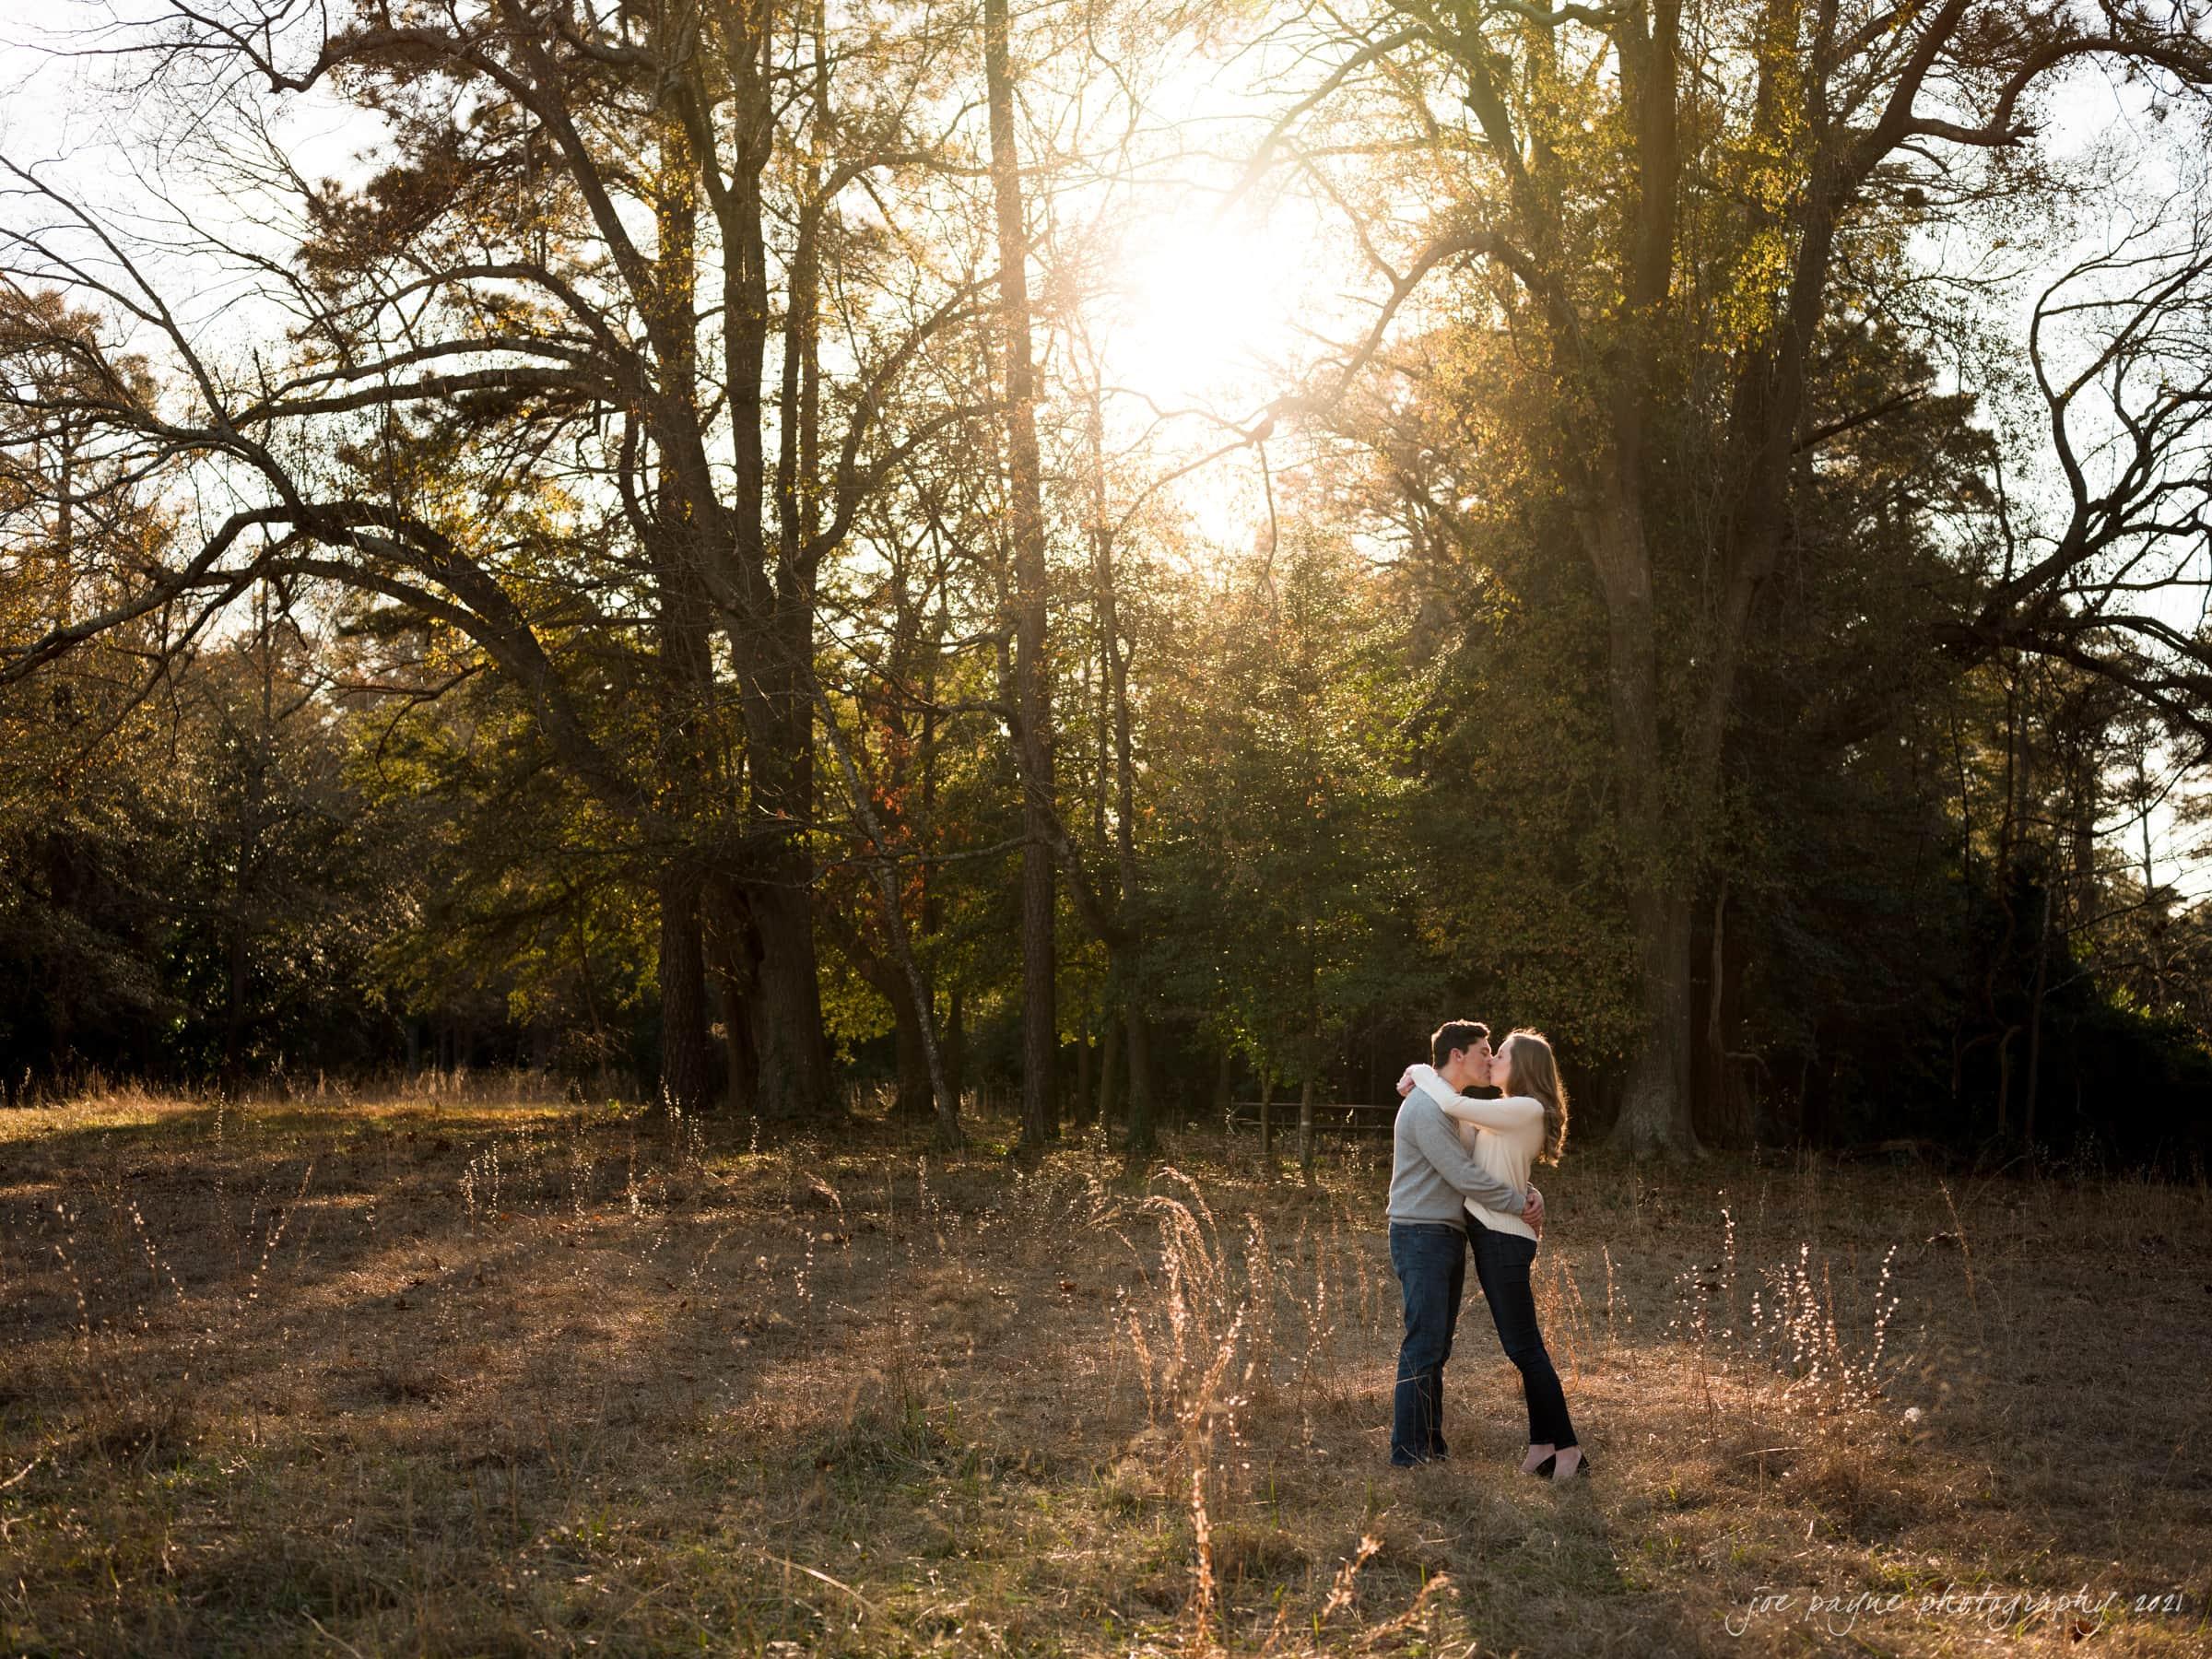 pinehurst engagement photography session lindsey brendan 5